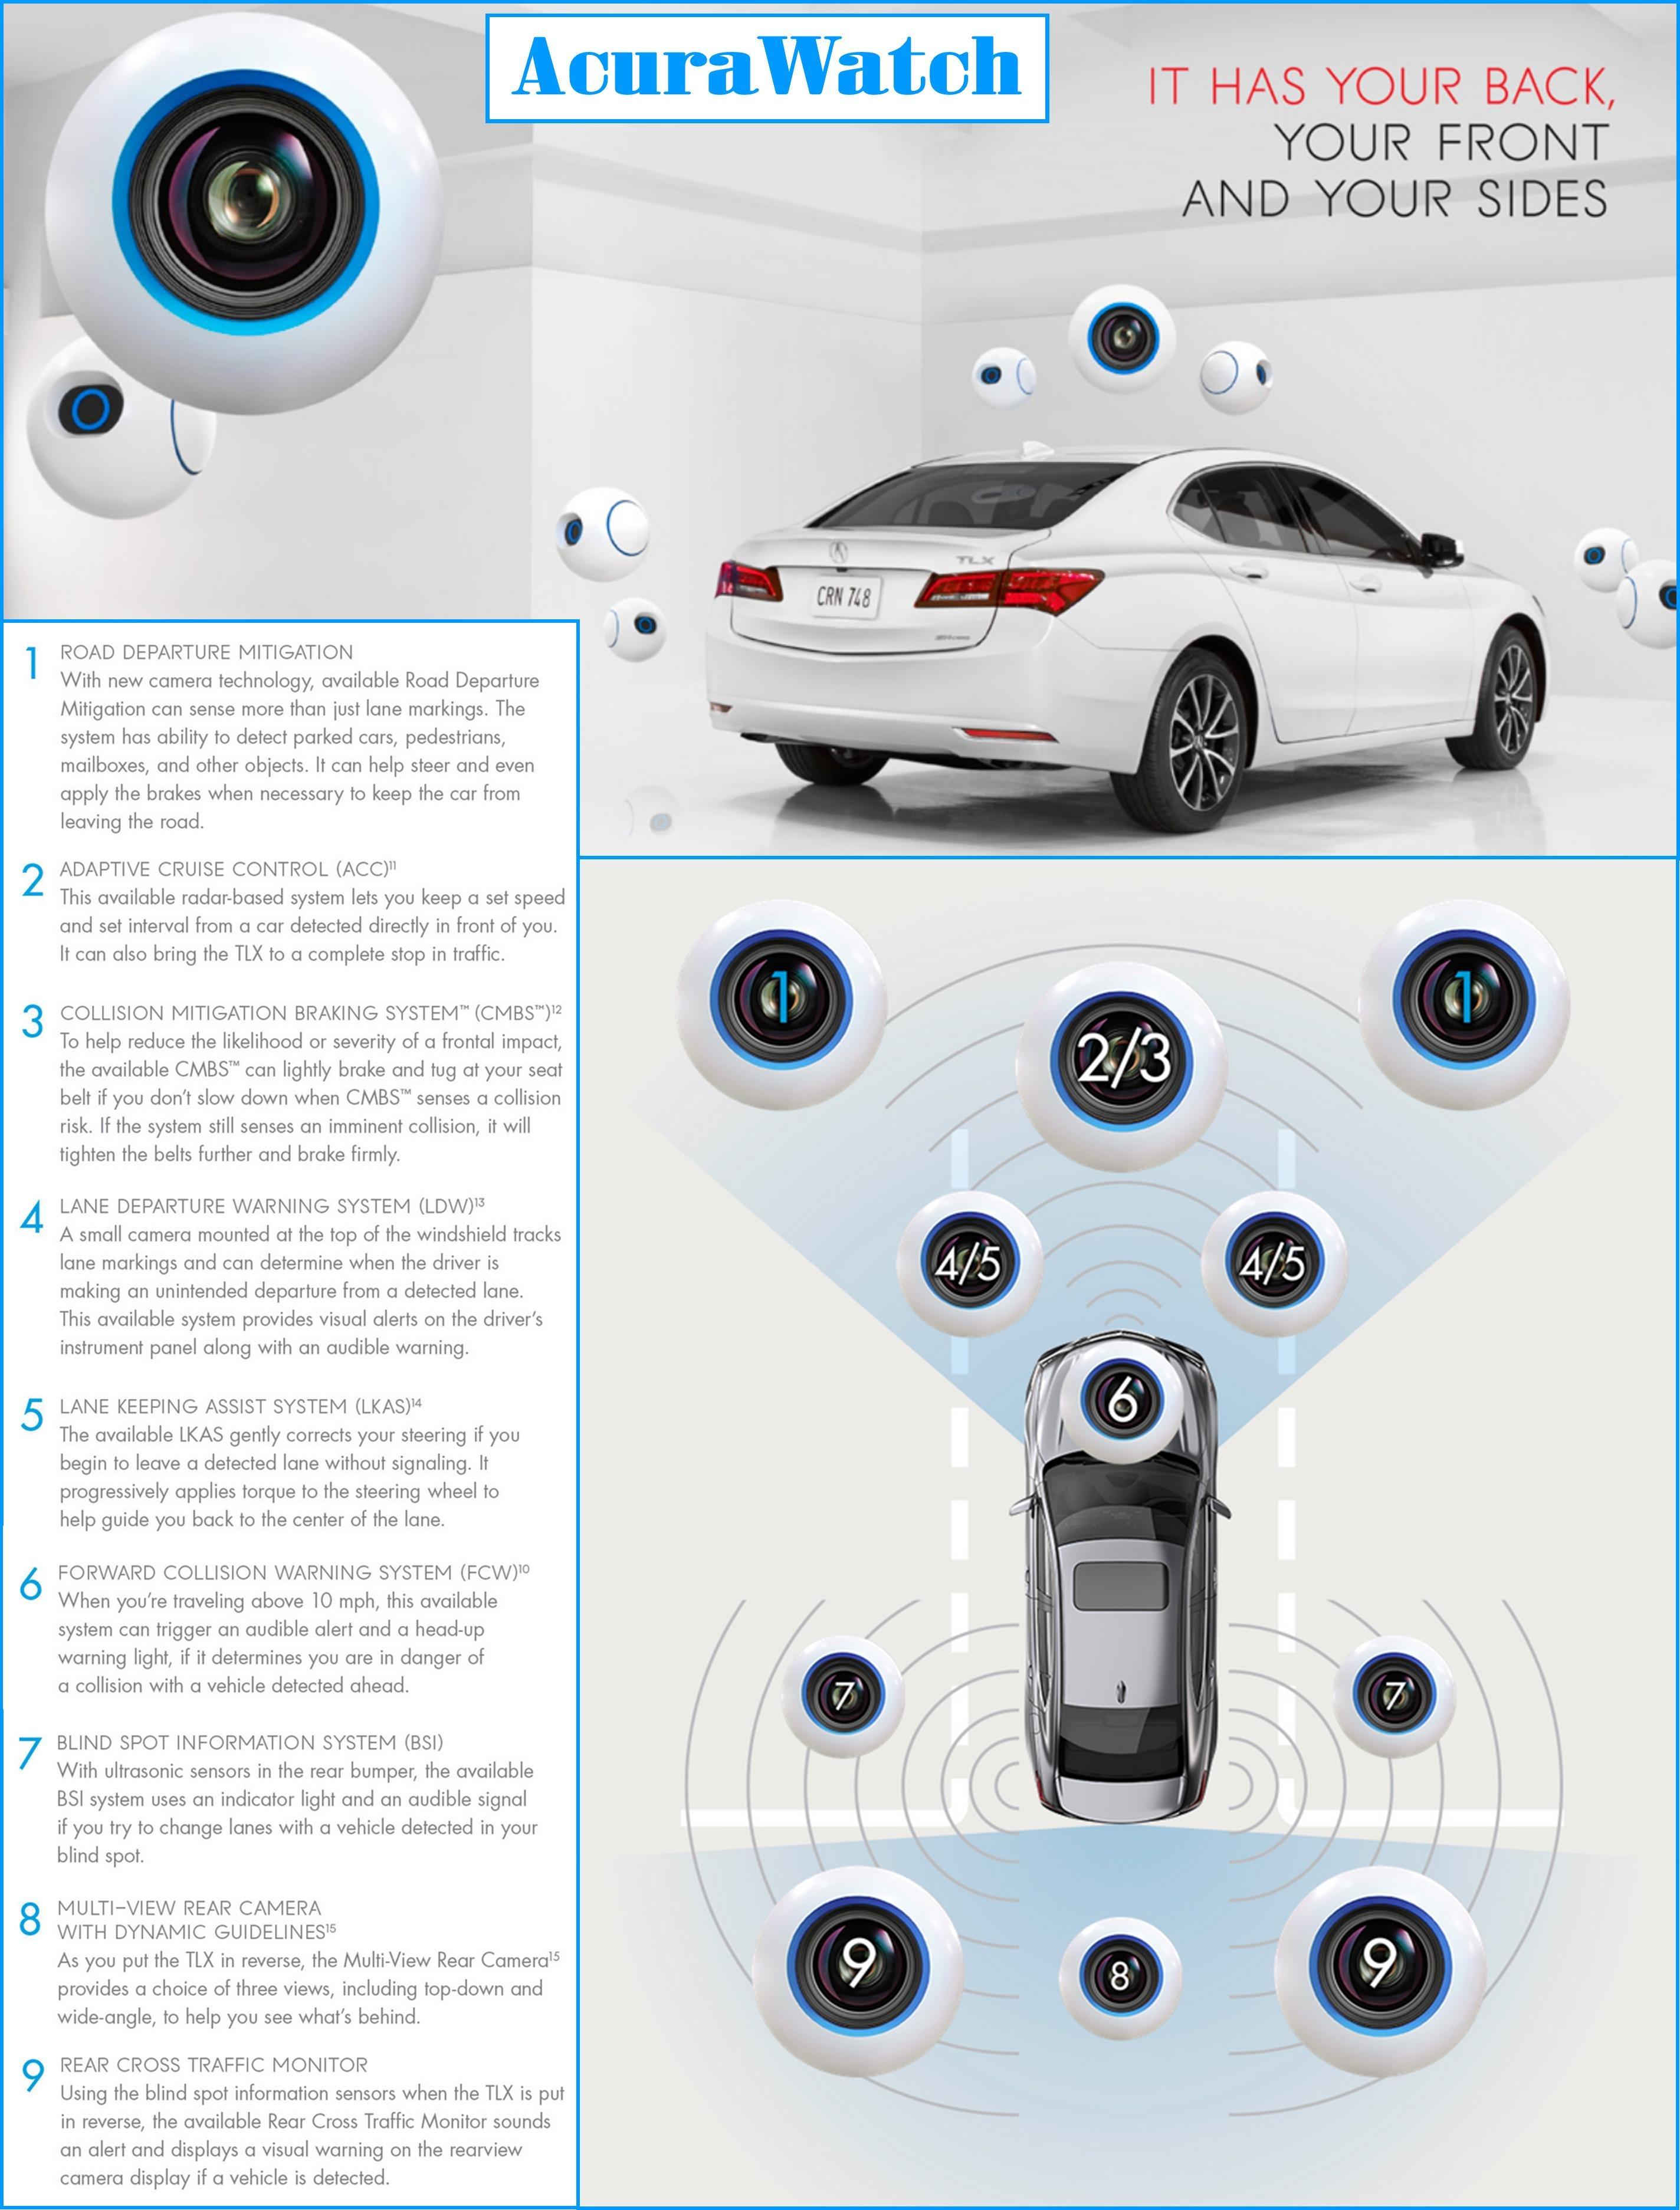 Acurawatchweb2.jpg